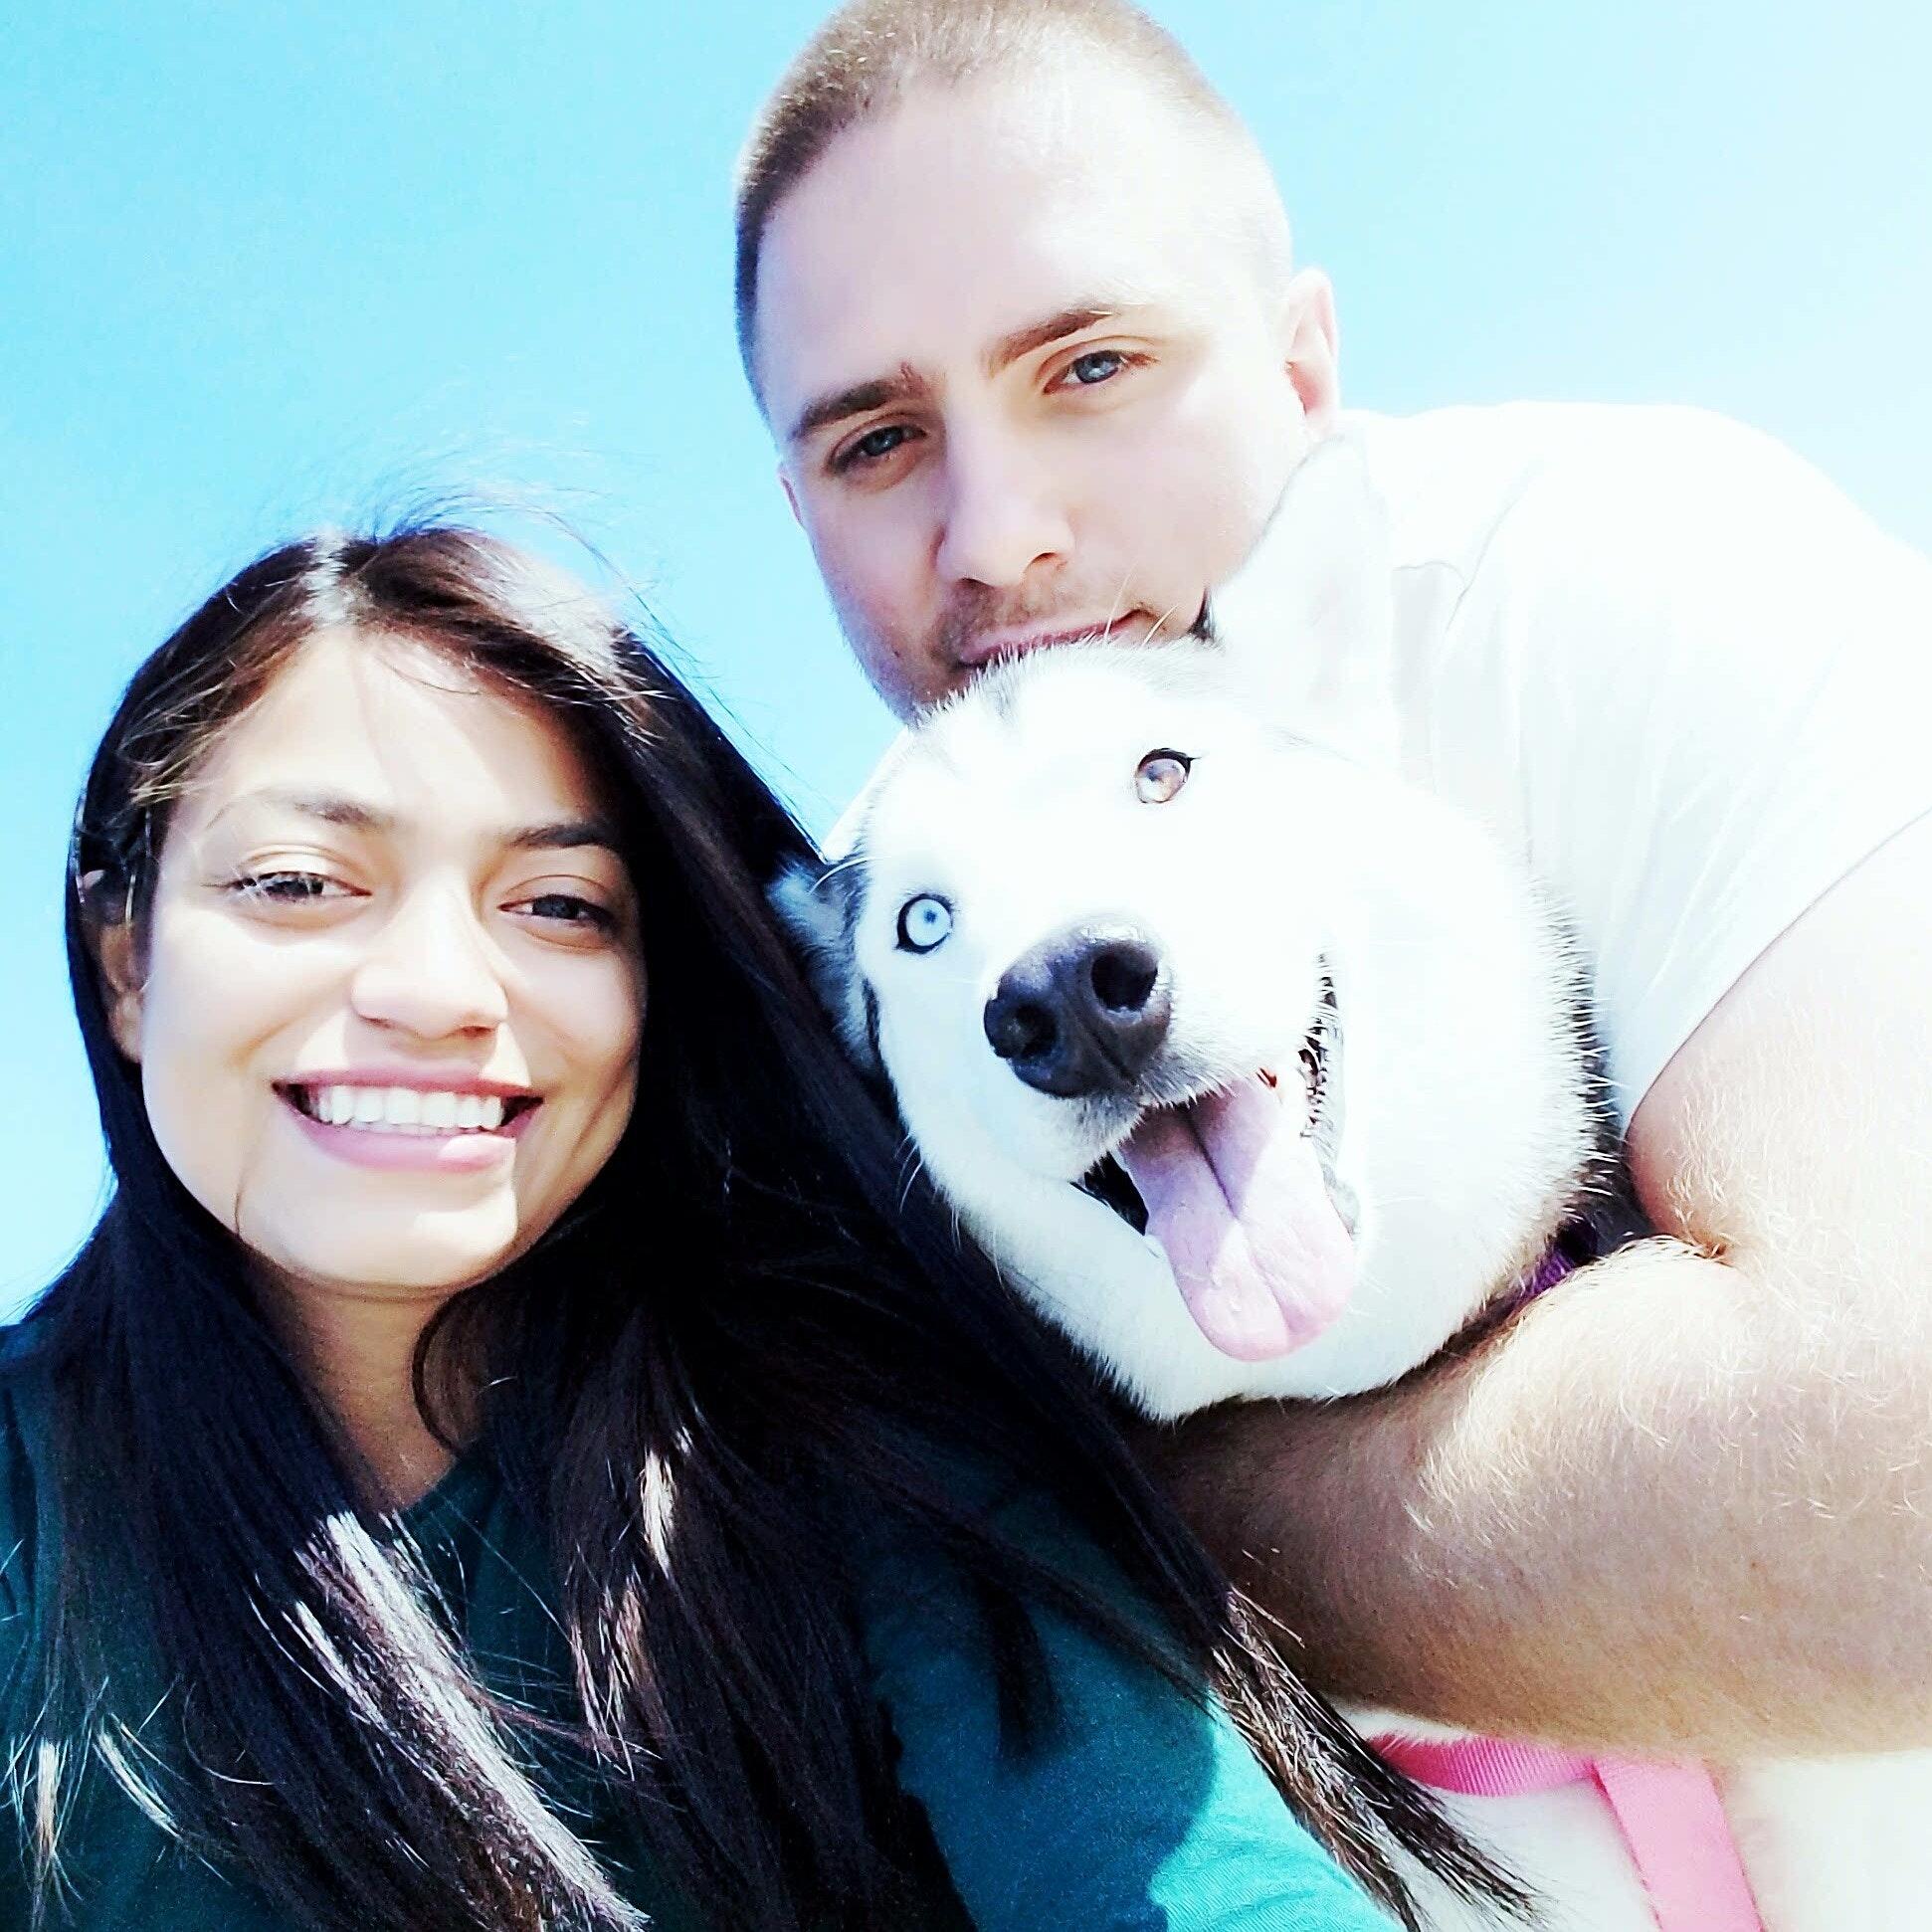 Sineydi's dog day care